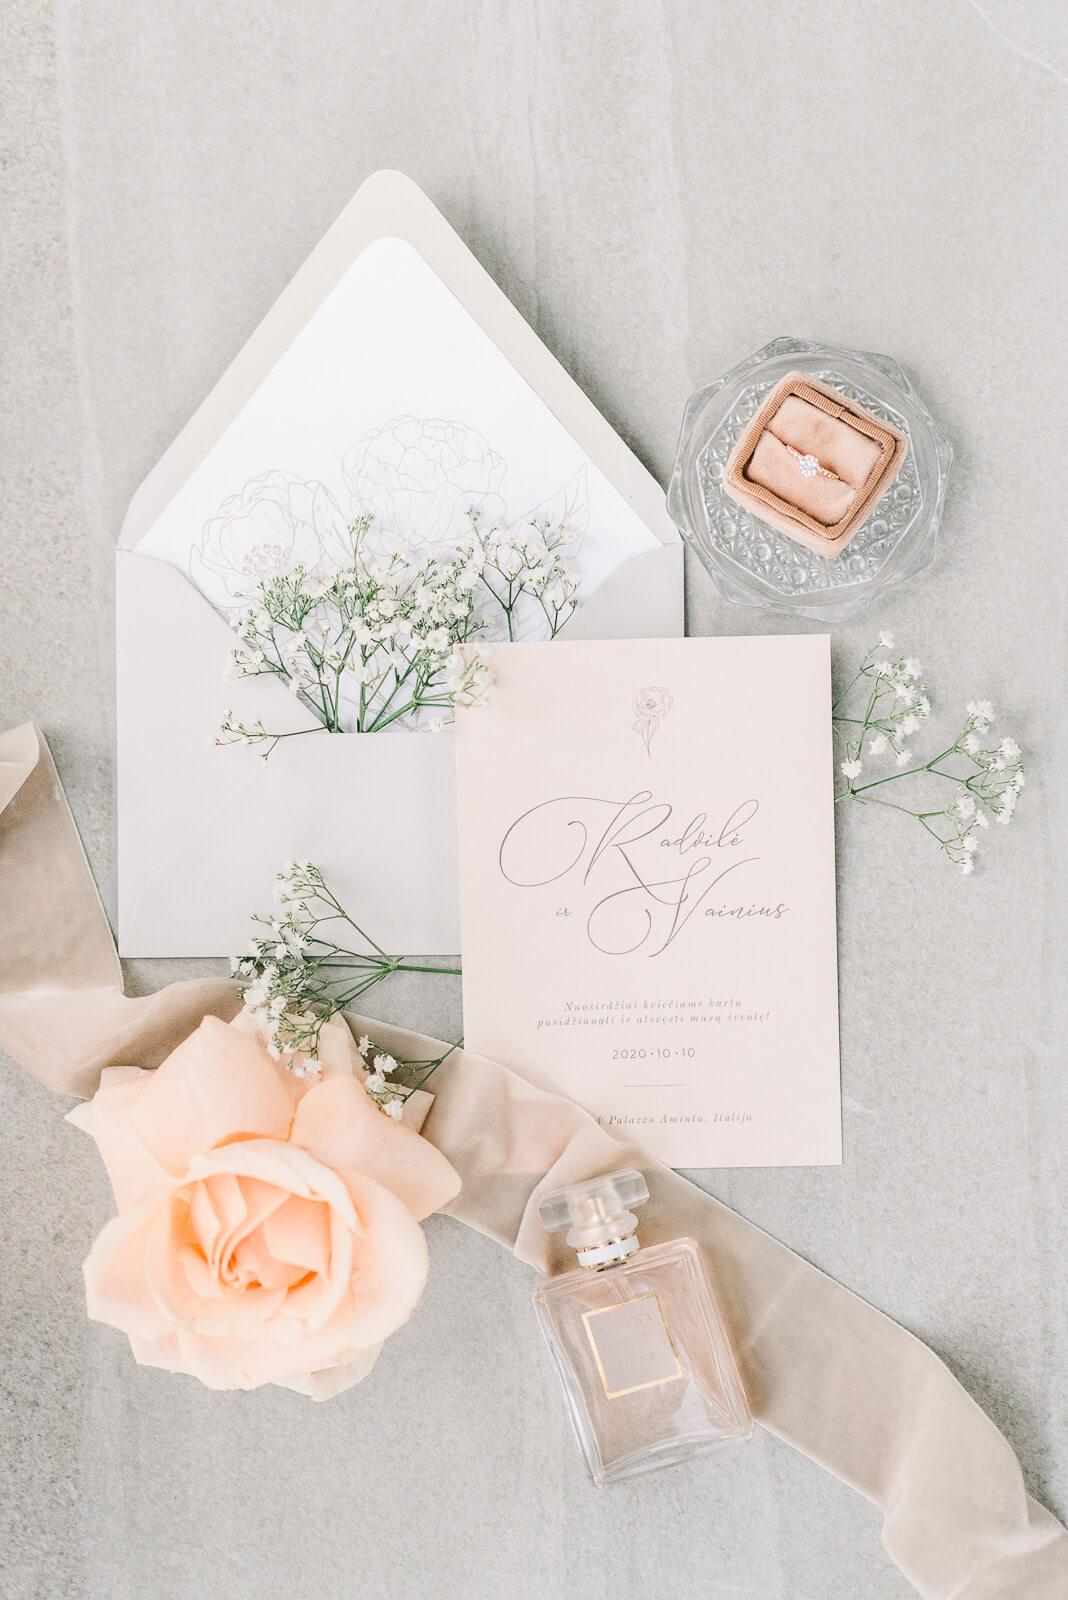 Vestuviu dekoro detales